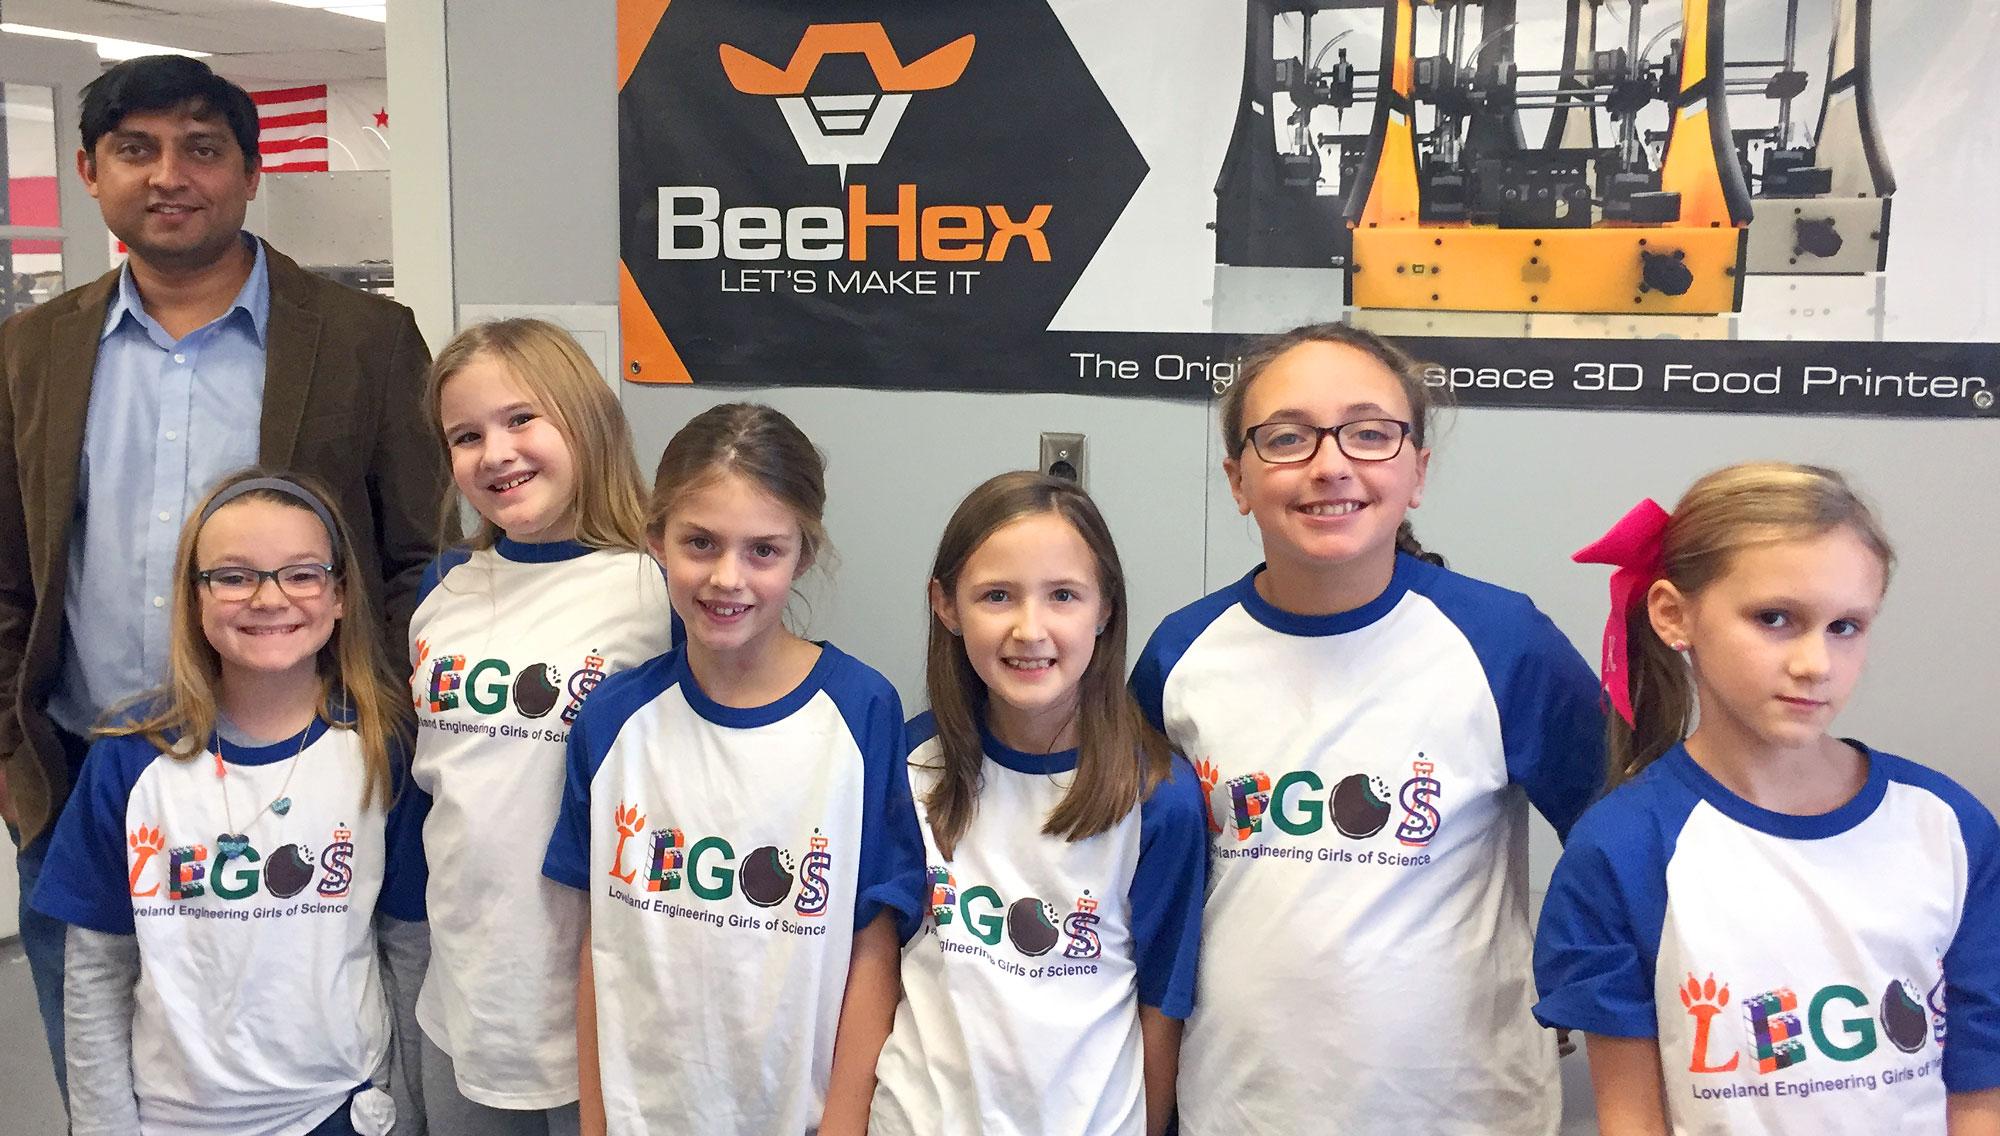 LEGOS_BeeHex_1.jpg